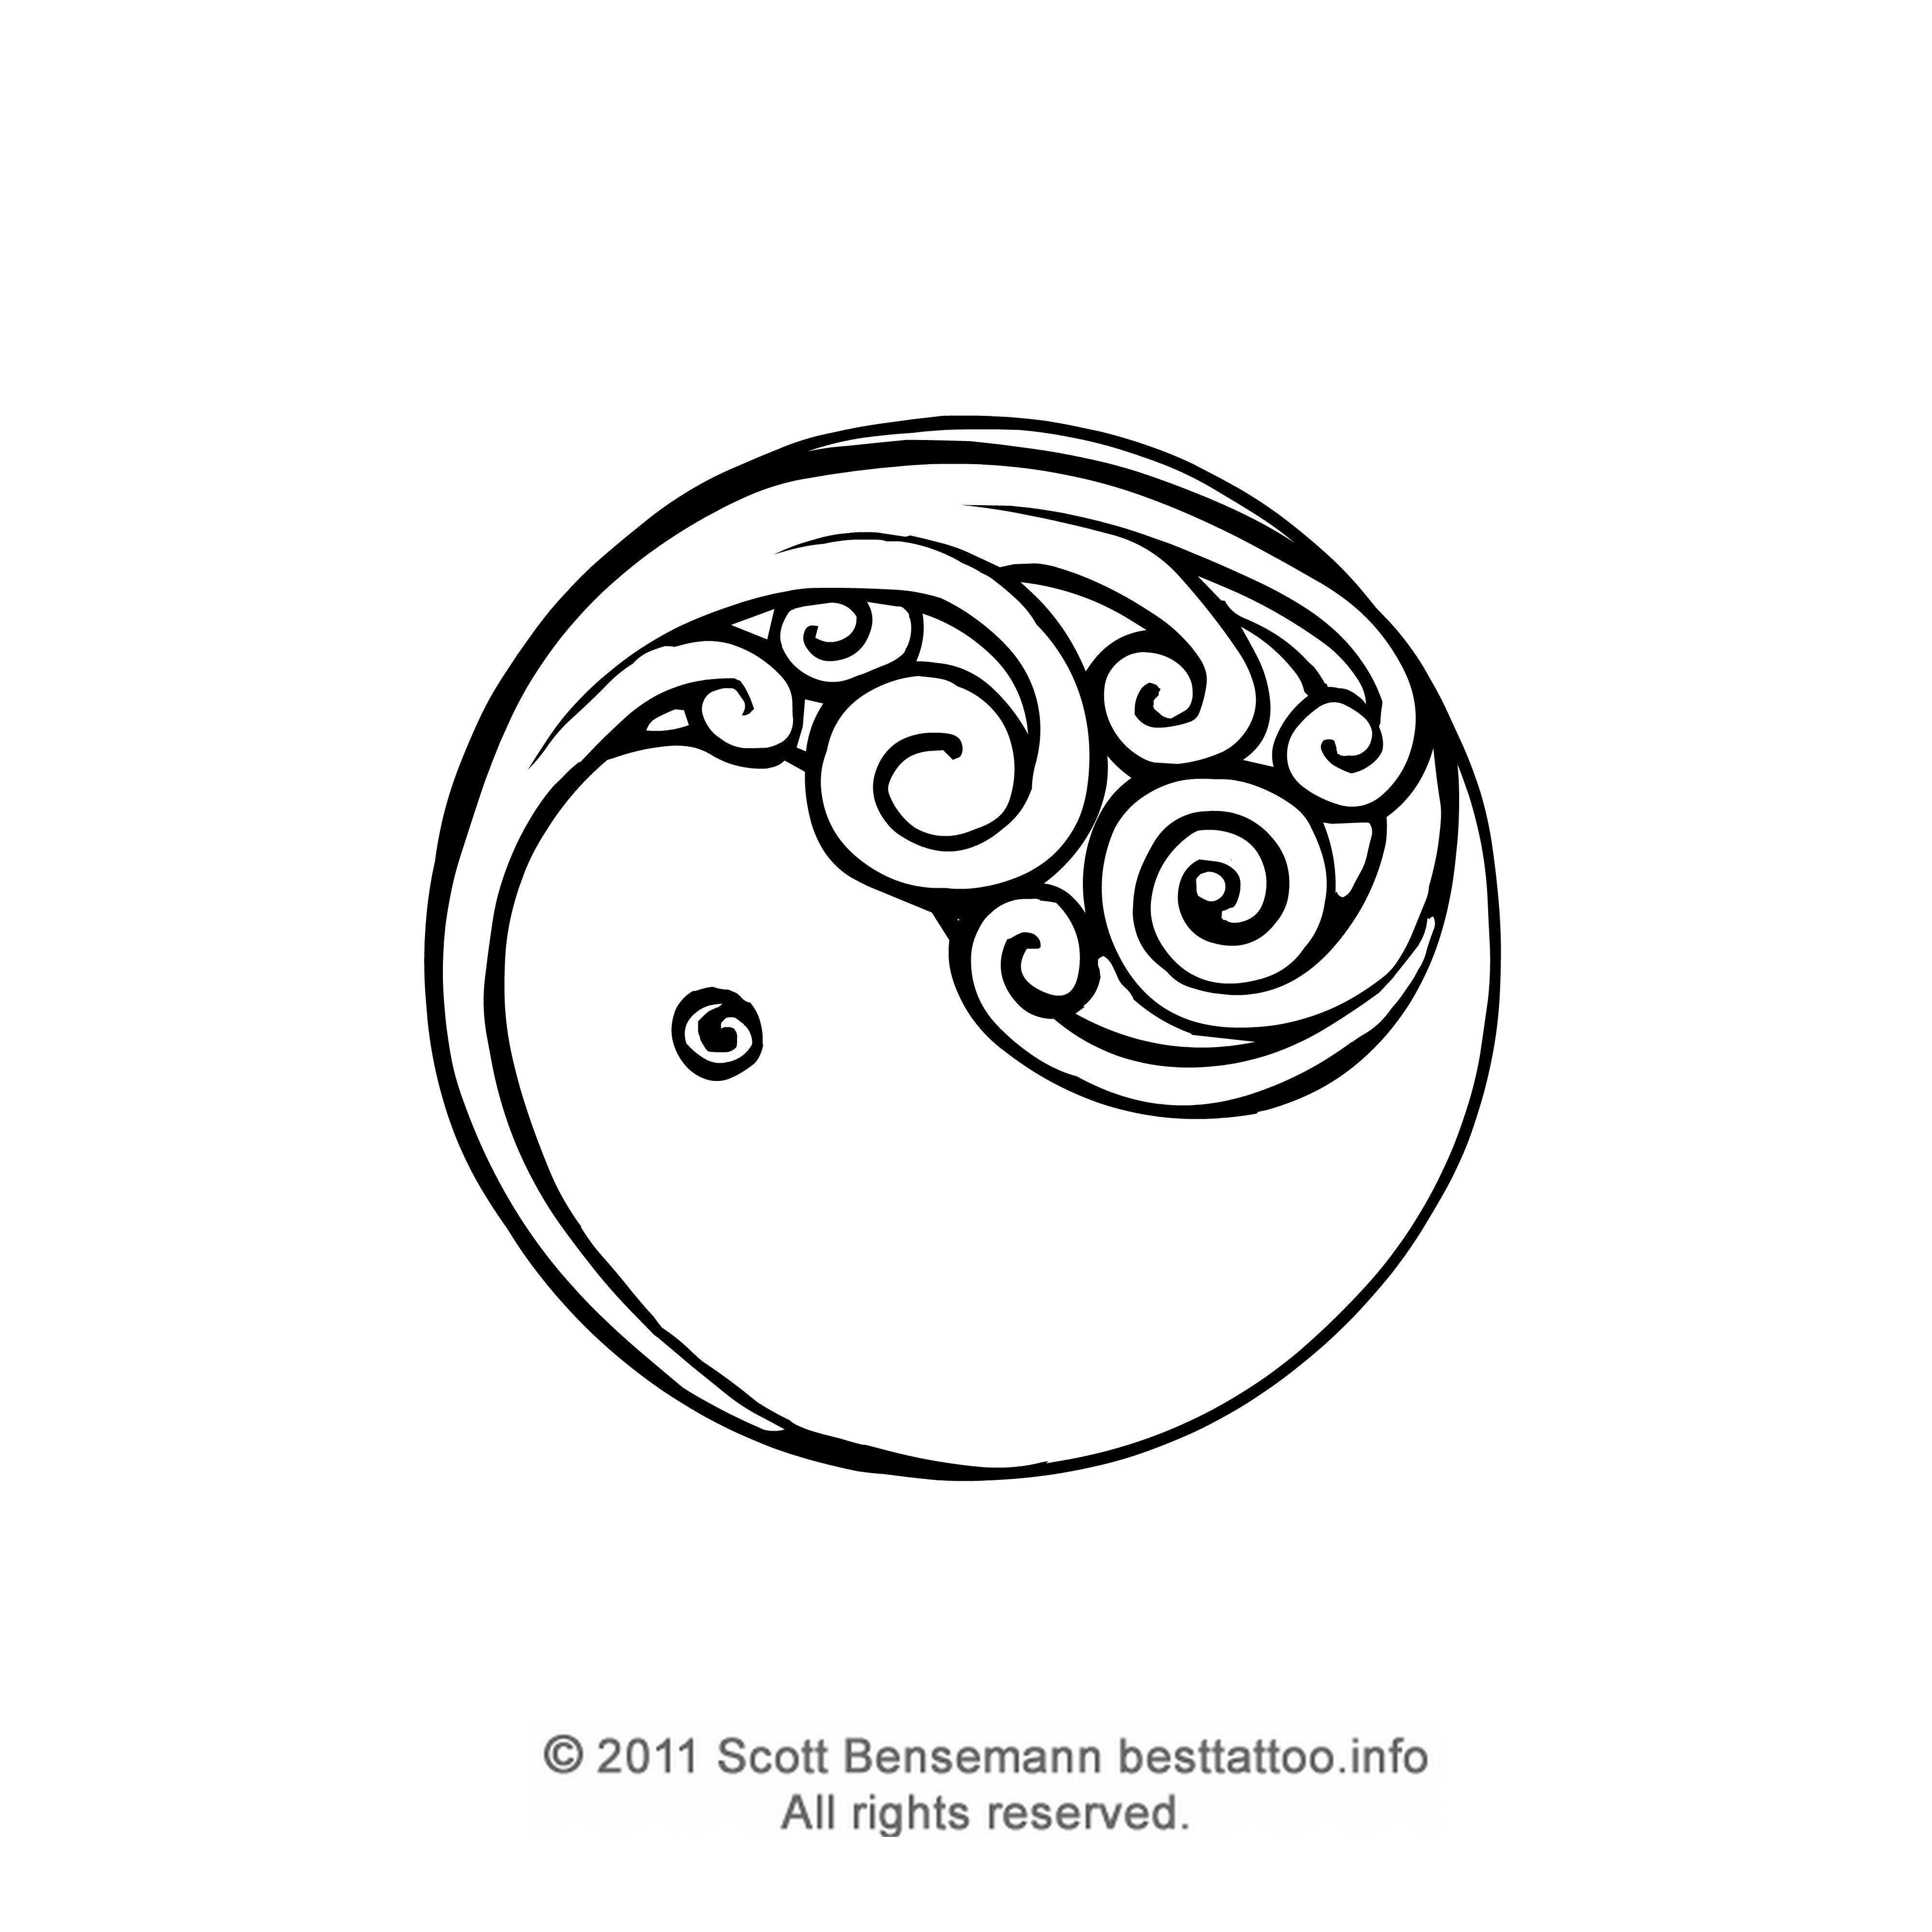 4000x4000 Maori Tattoo Design Silver Fern Koru Yin And Yang Style